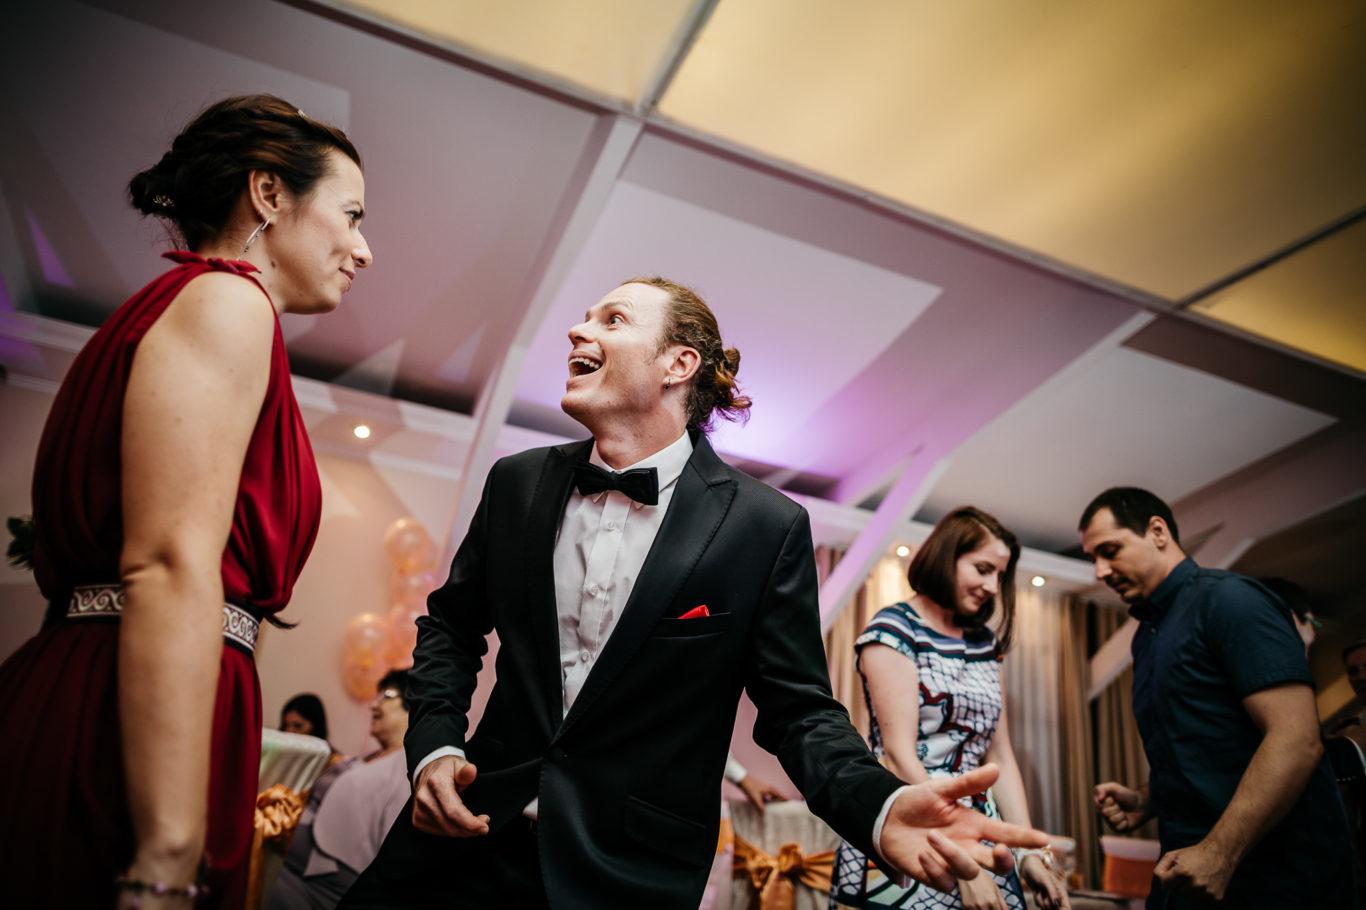 0691-fotografie-nunta-bucuresti-dana-radu-fotograf-ciprian-dumitrescu-dc1_4262